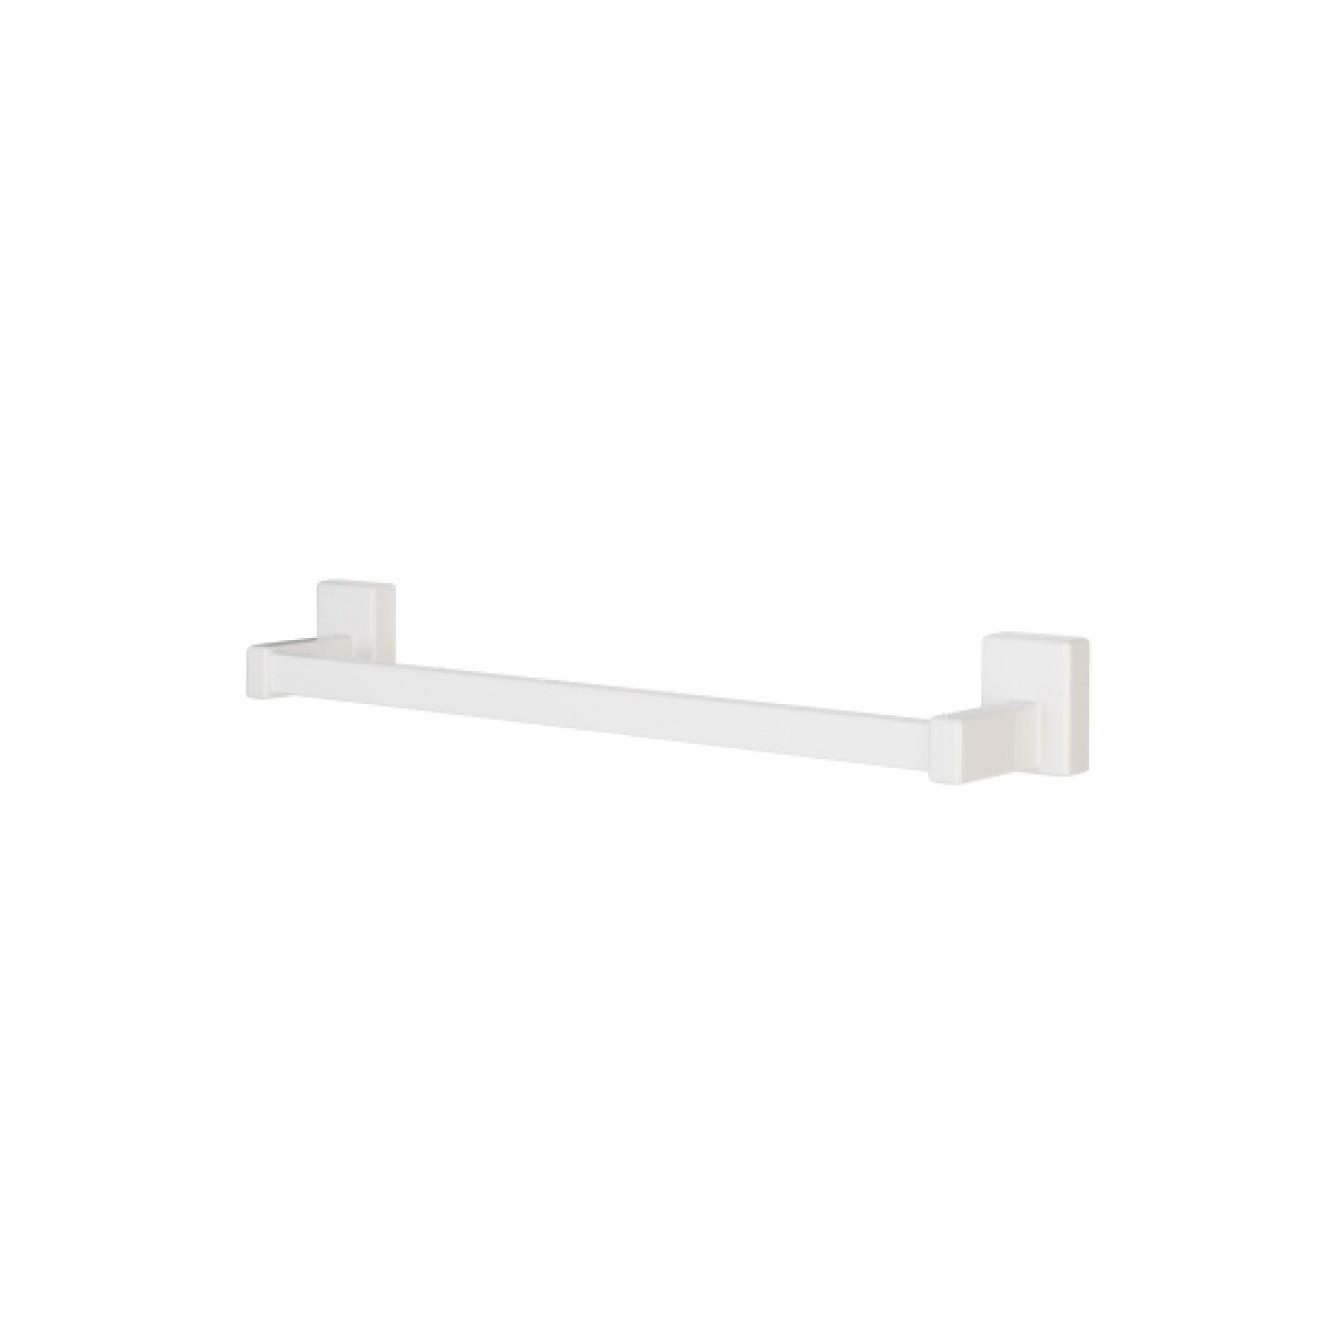 magnet handtuchstange handtuchhalter 40 cm weiss f r heizk rper treffpunkt bad der shop f r. Black Bedroom Furniture Sets. Home Design Ideas